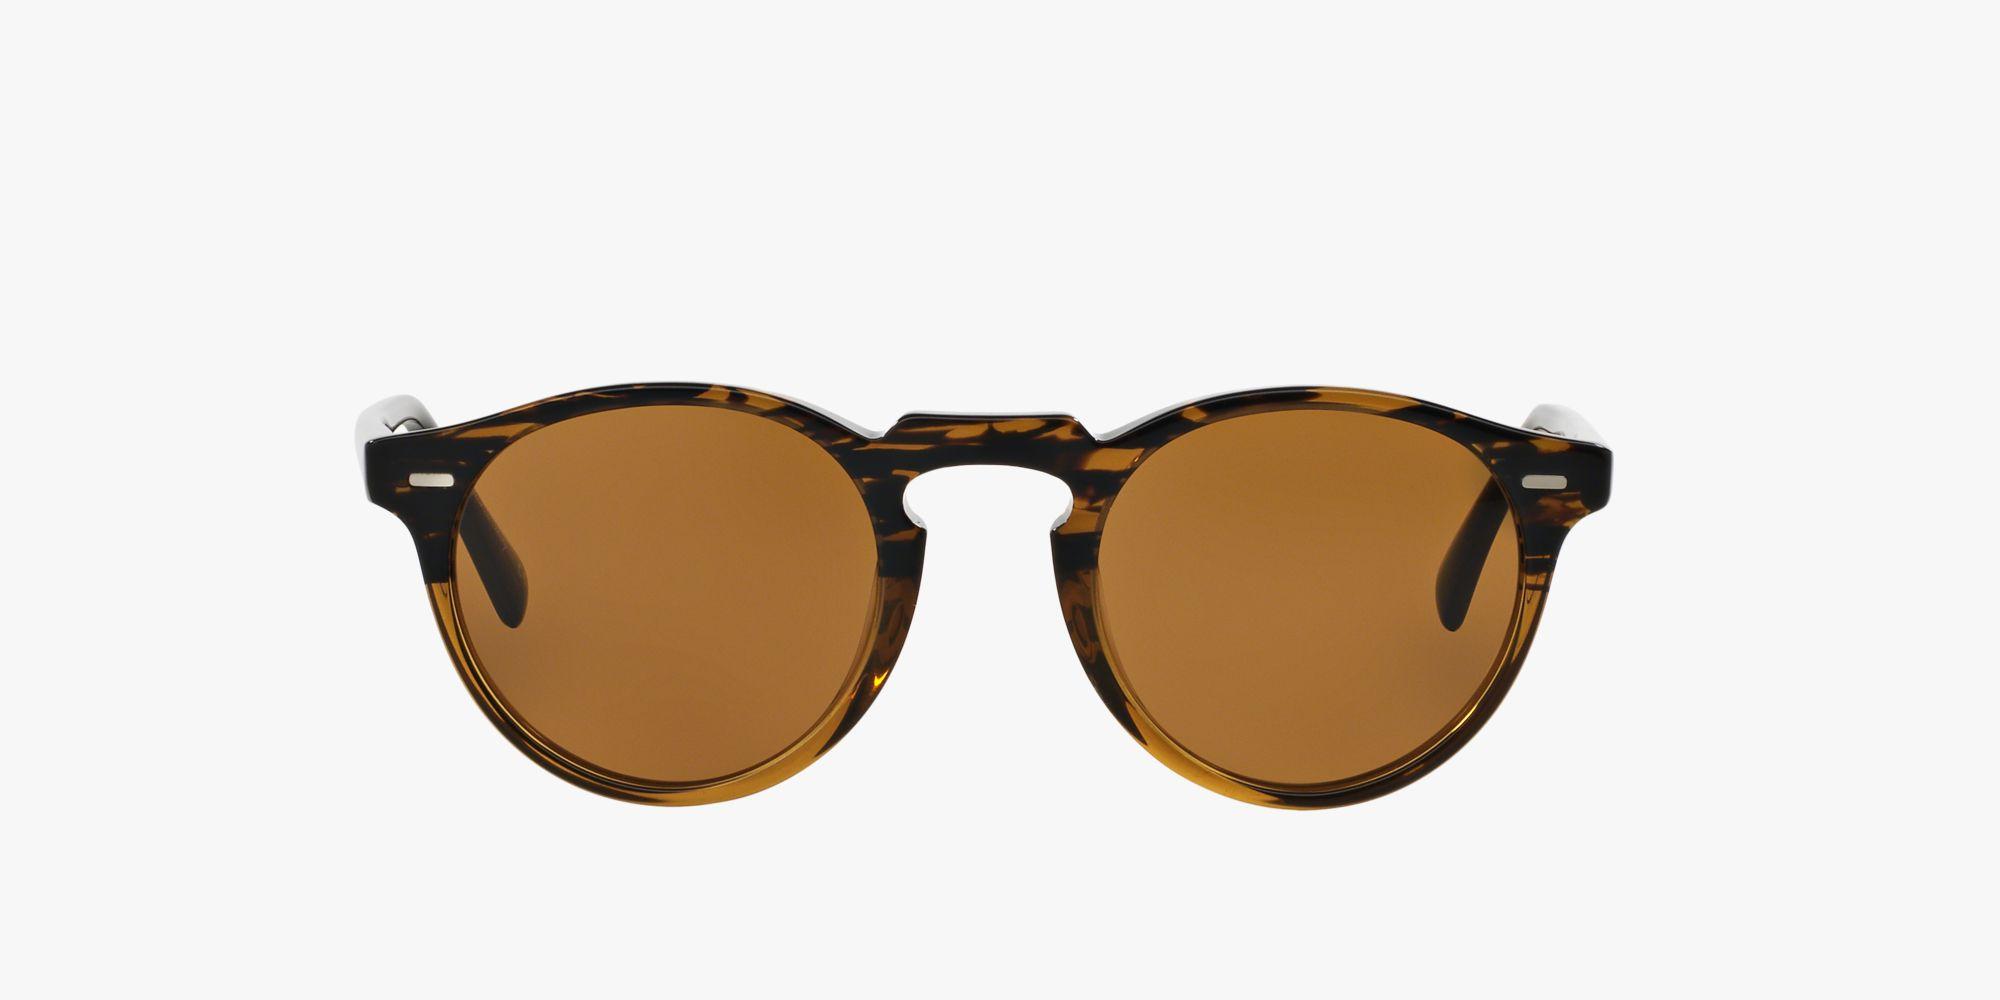 Oliver Peoples Gregory Peck Sun Sonnenbrille Transparent Dunkelbraun und Tortoise 1485W4 47mm 9PxGheT